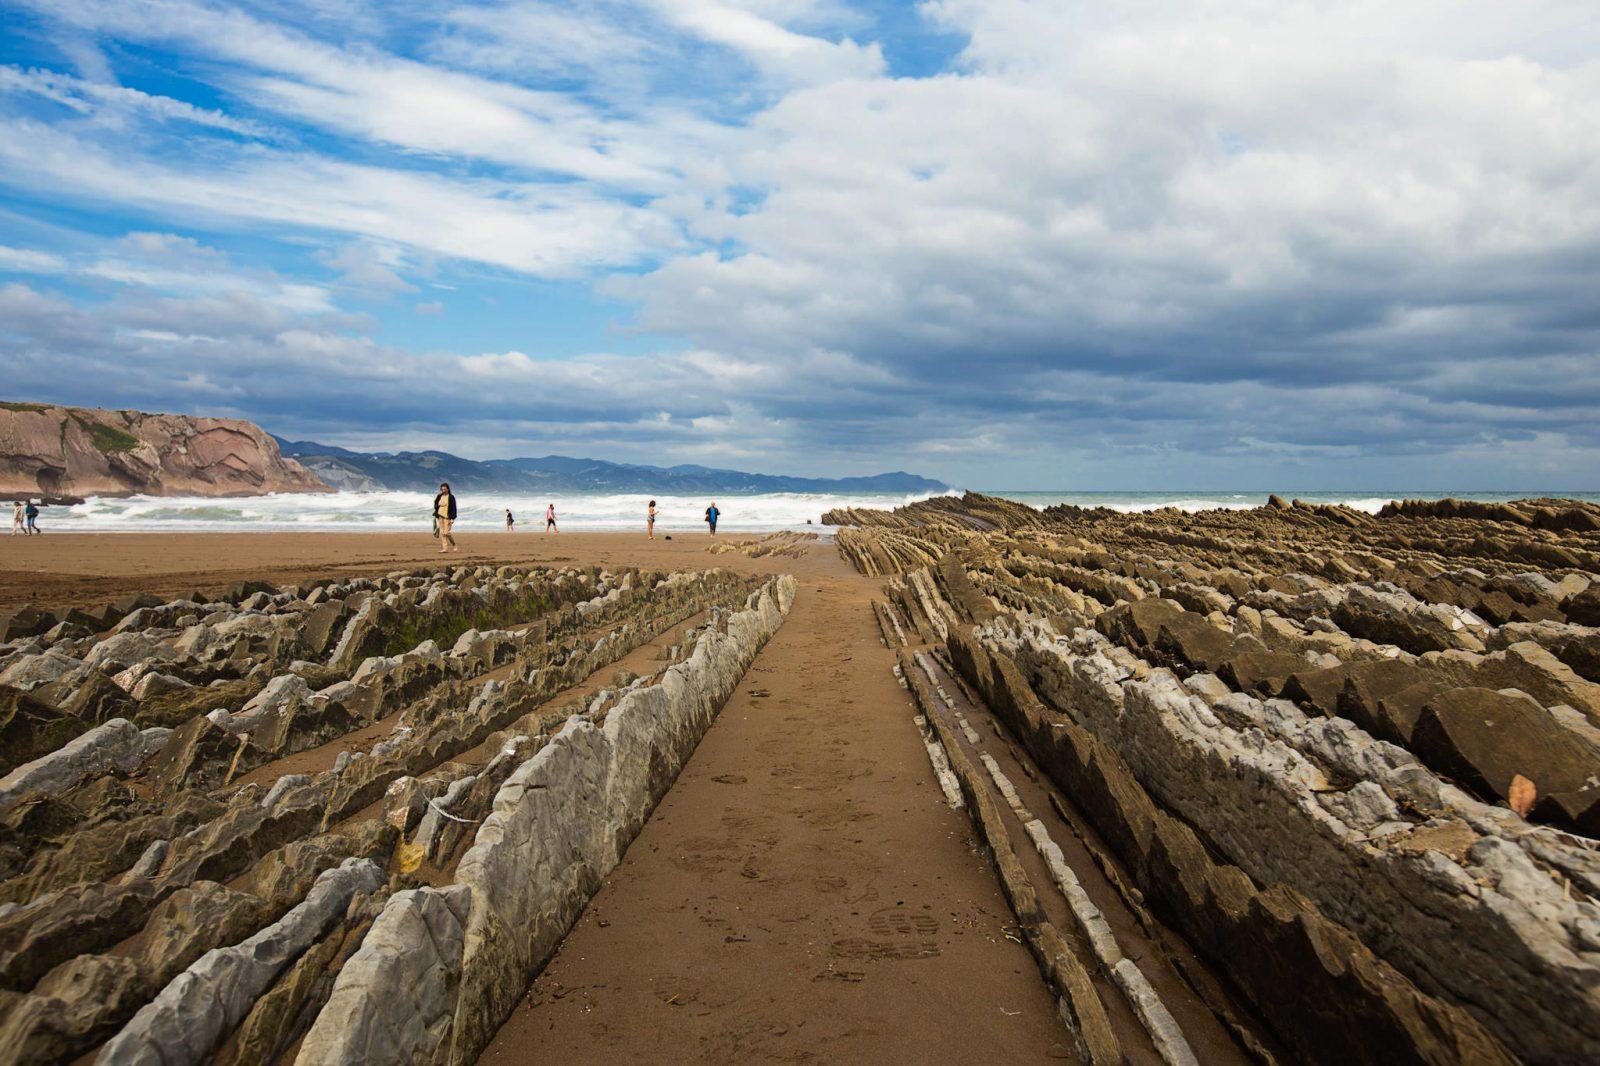 Геопарк баскского побережья  (фото: Torbjørn Tiller)